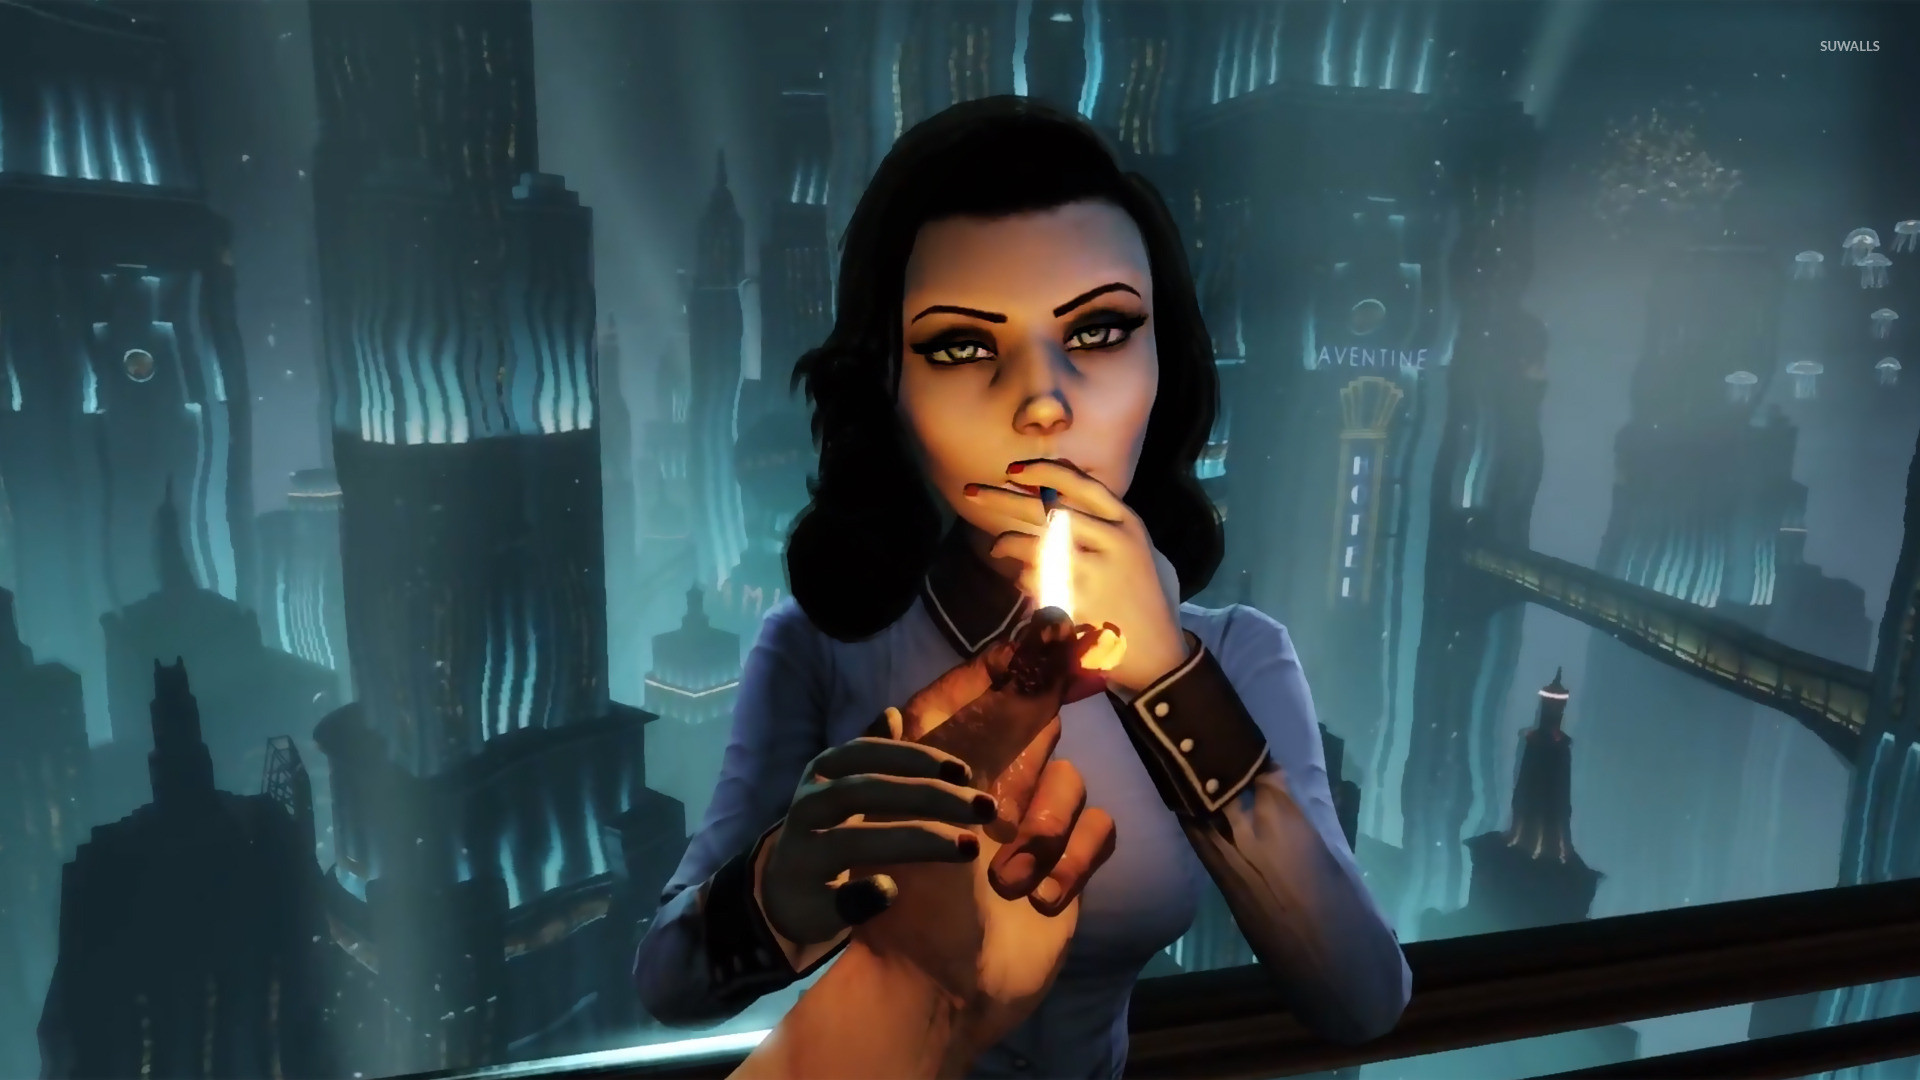 Elizabeth -BioShock Infinite: Burial at Sea wallpaper jpg